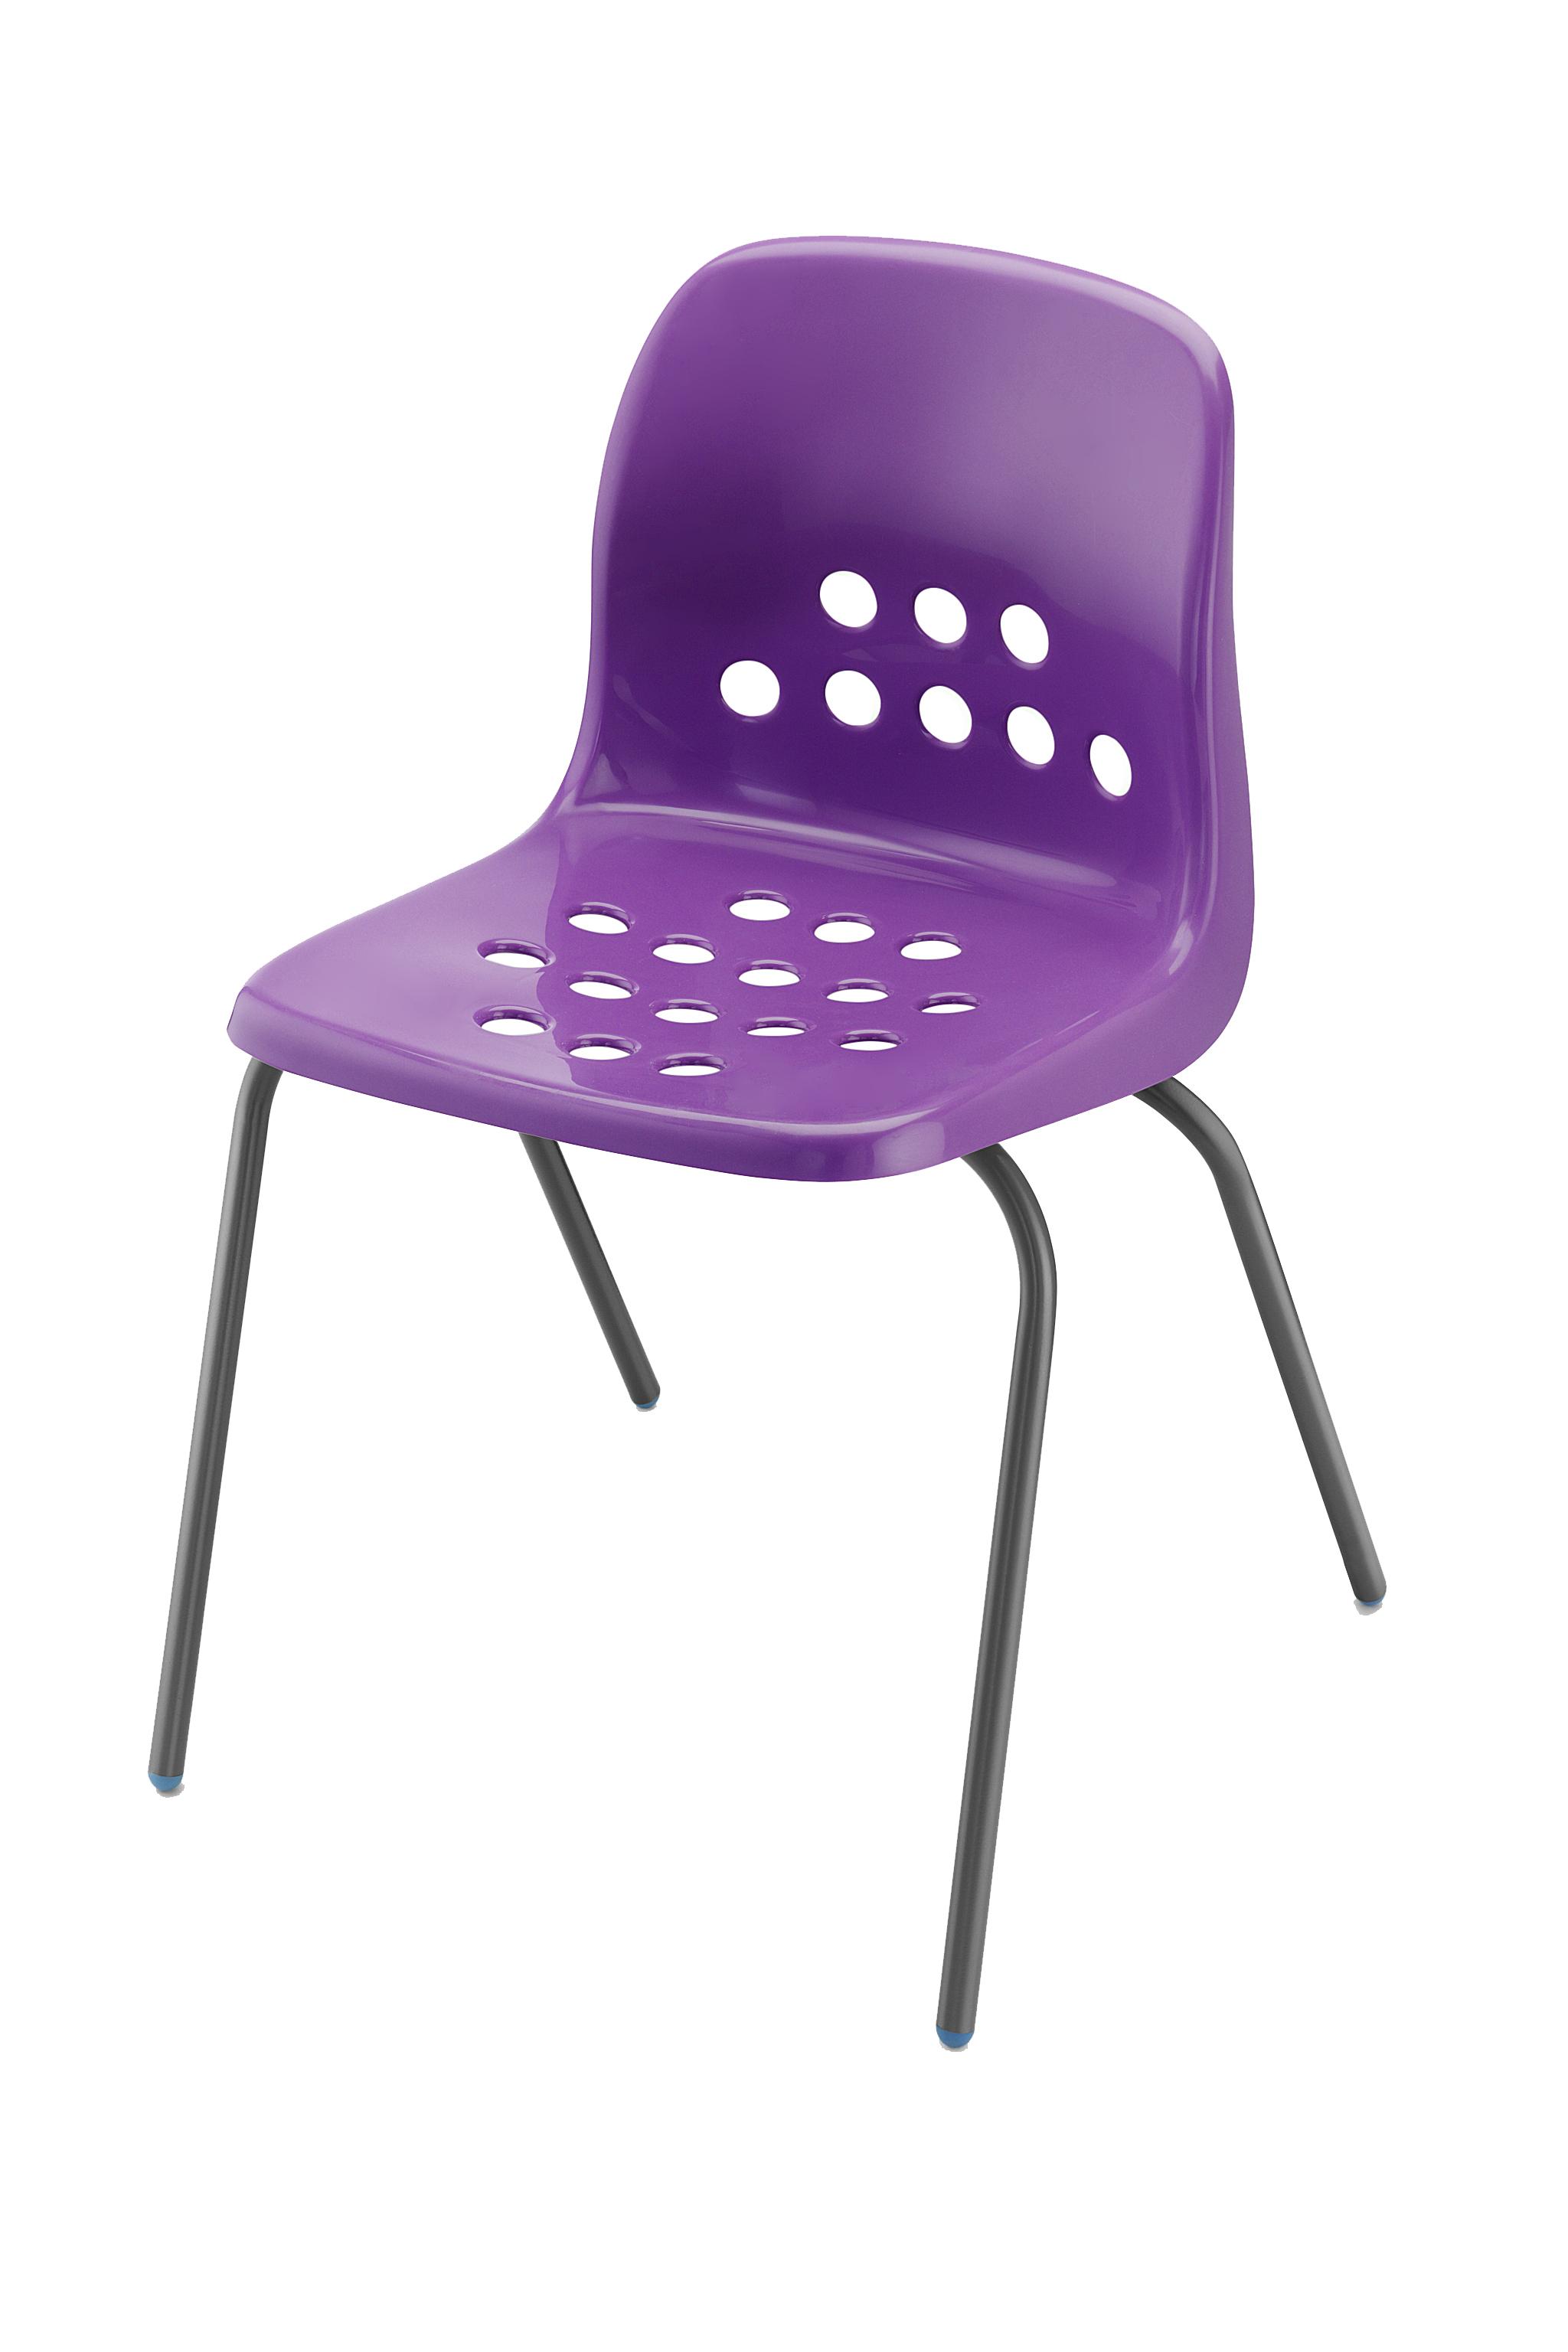 SG2062 purple